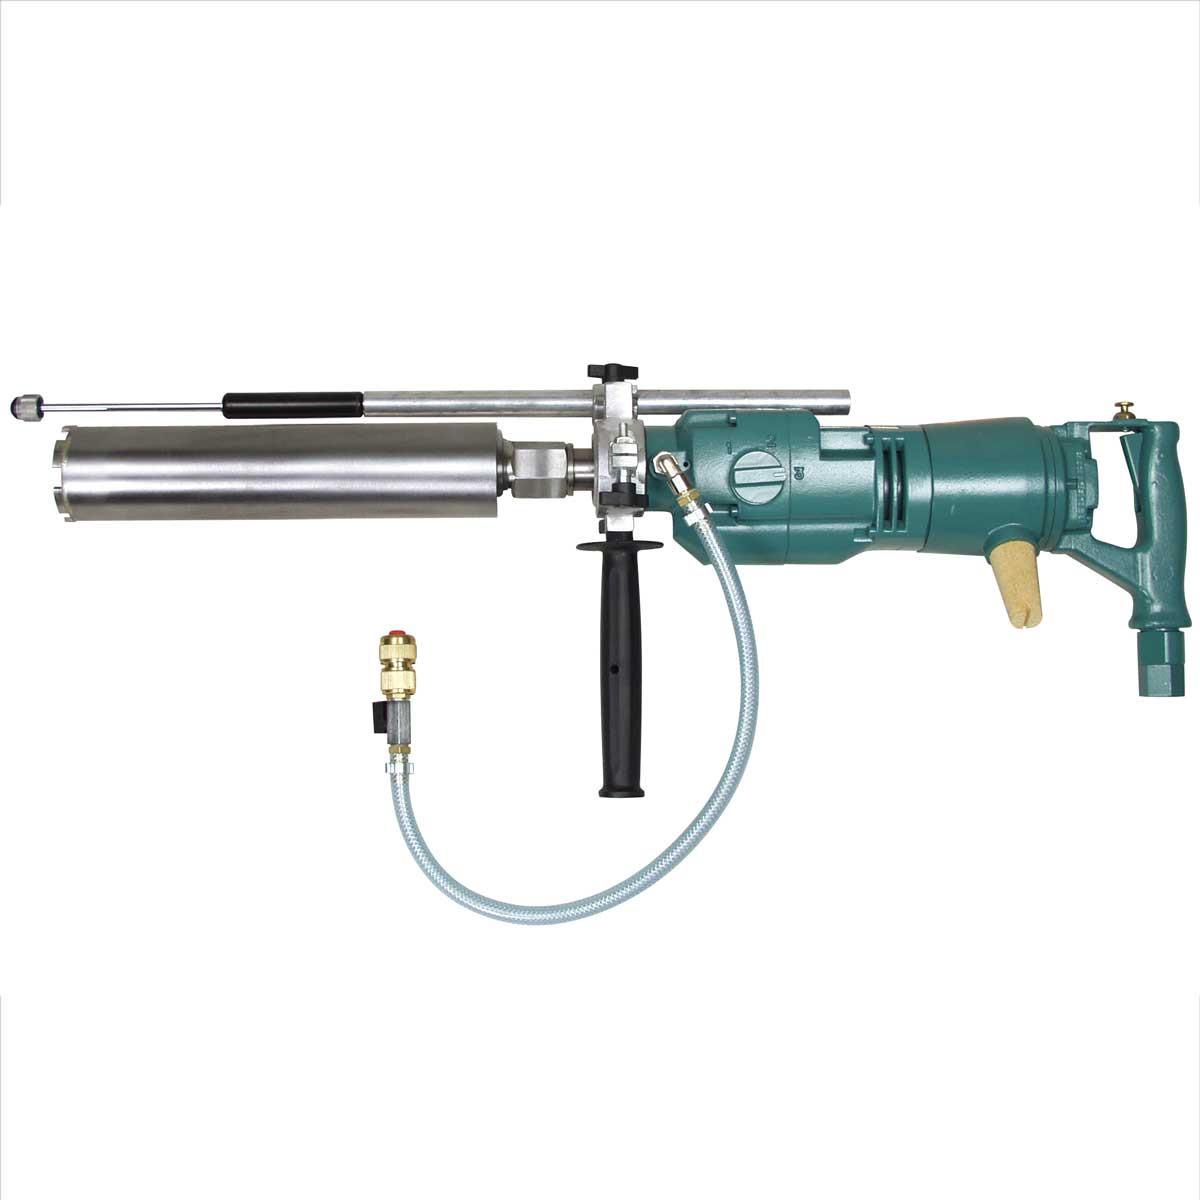 CS Unitec Air hand held core drill